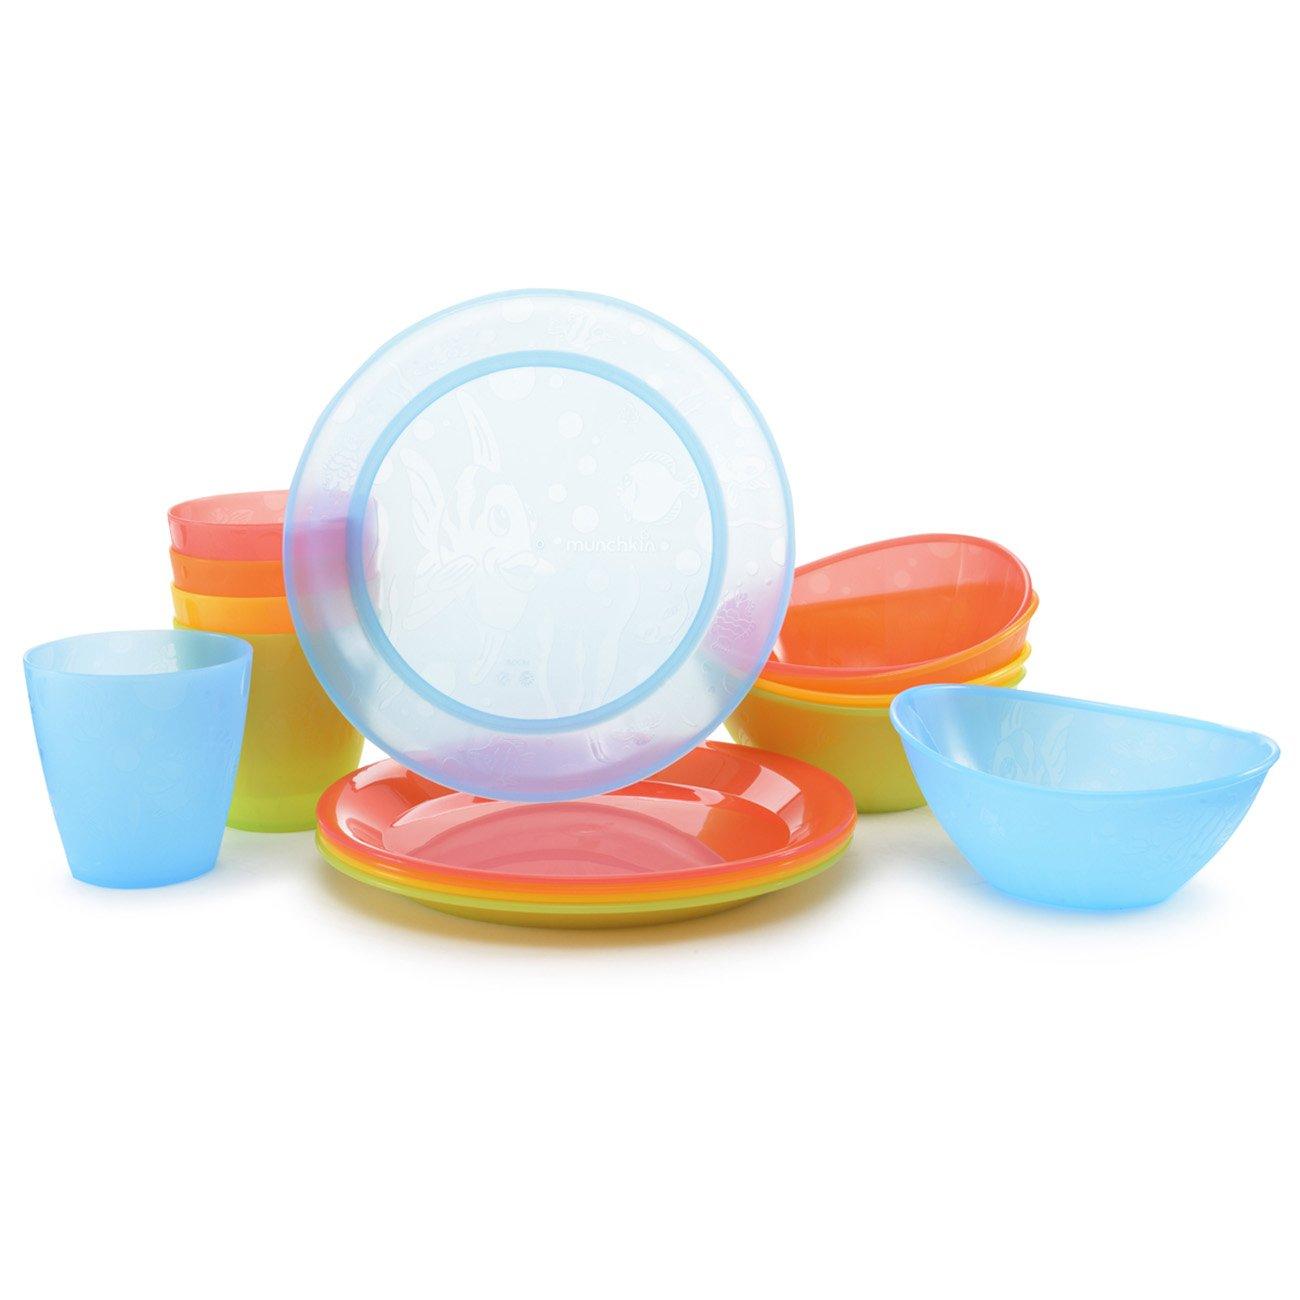 Munchkin Feeding Set, 15 Pack by Munchkin